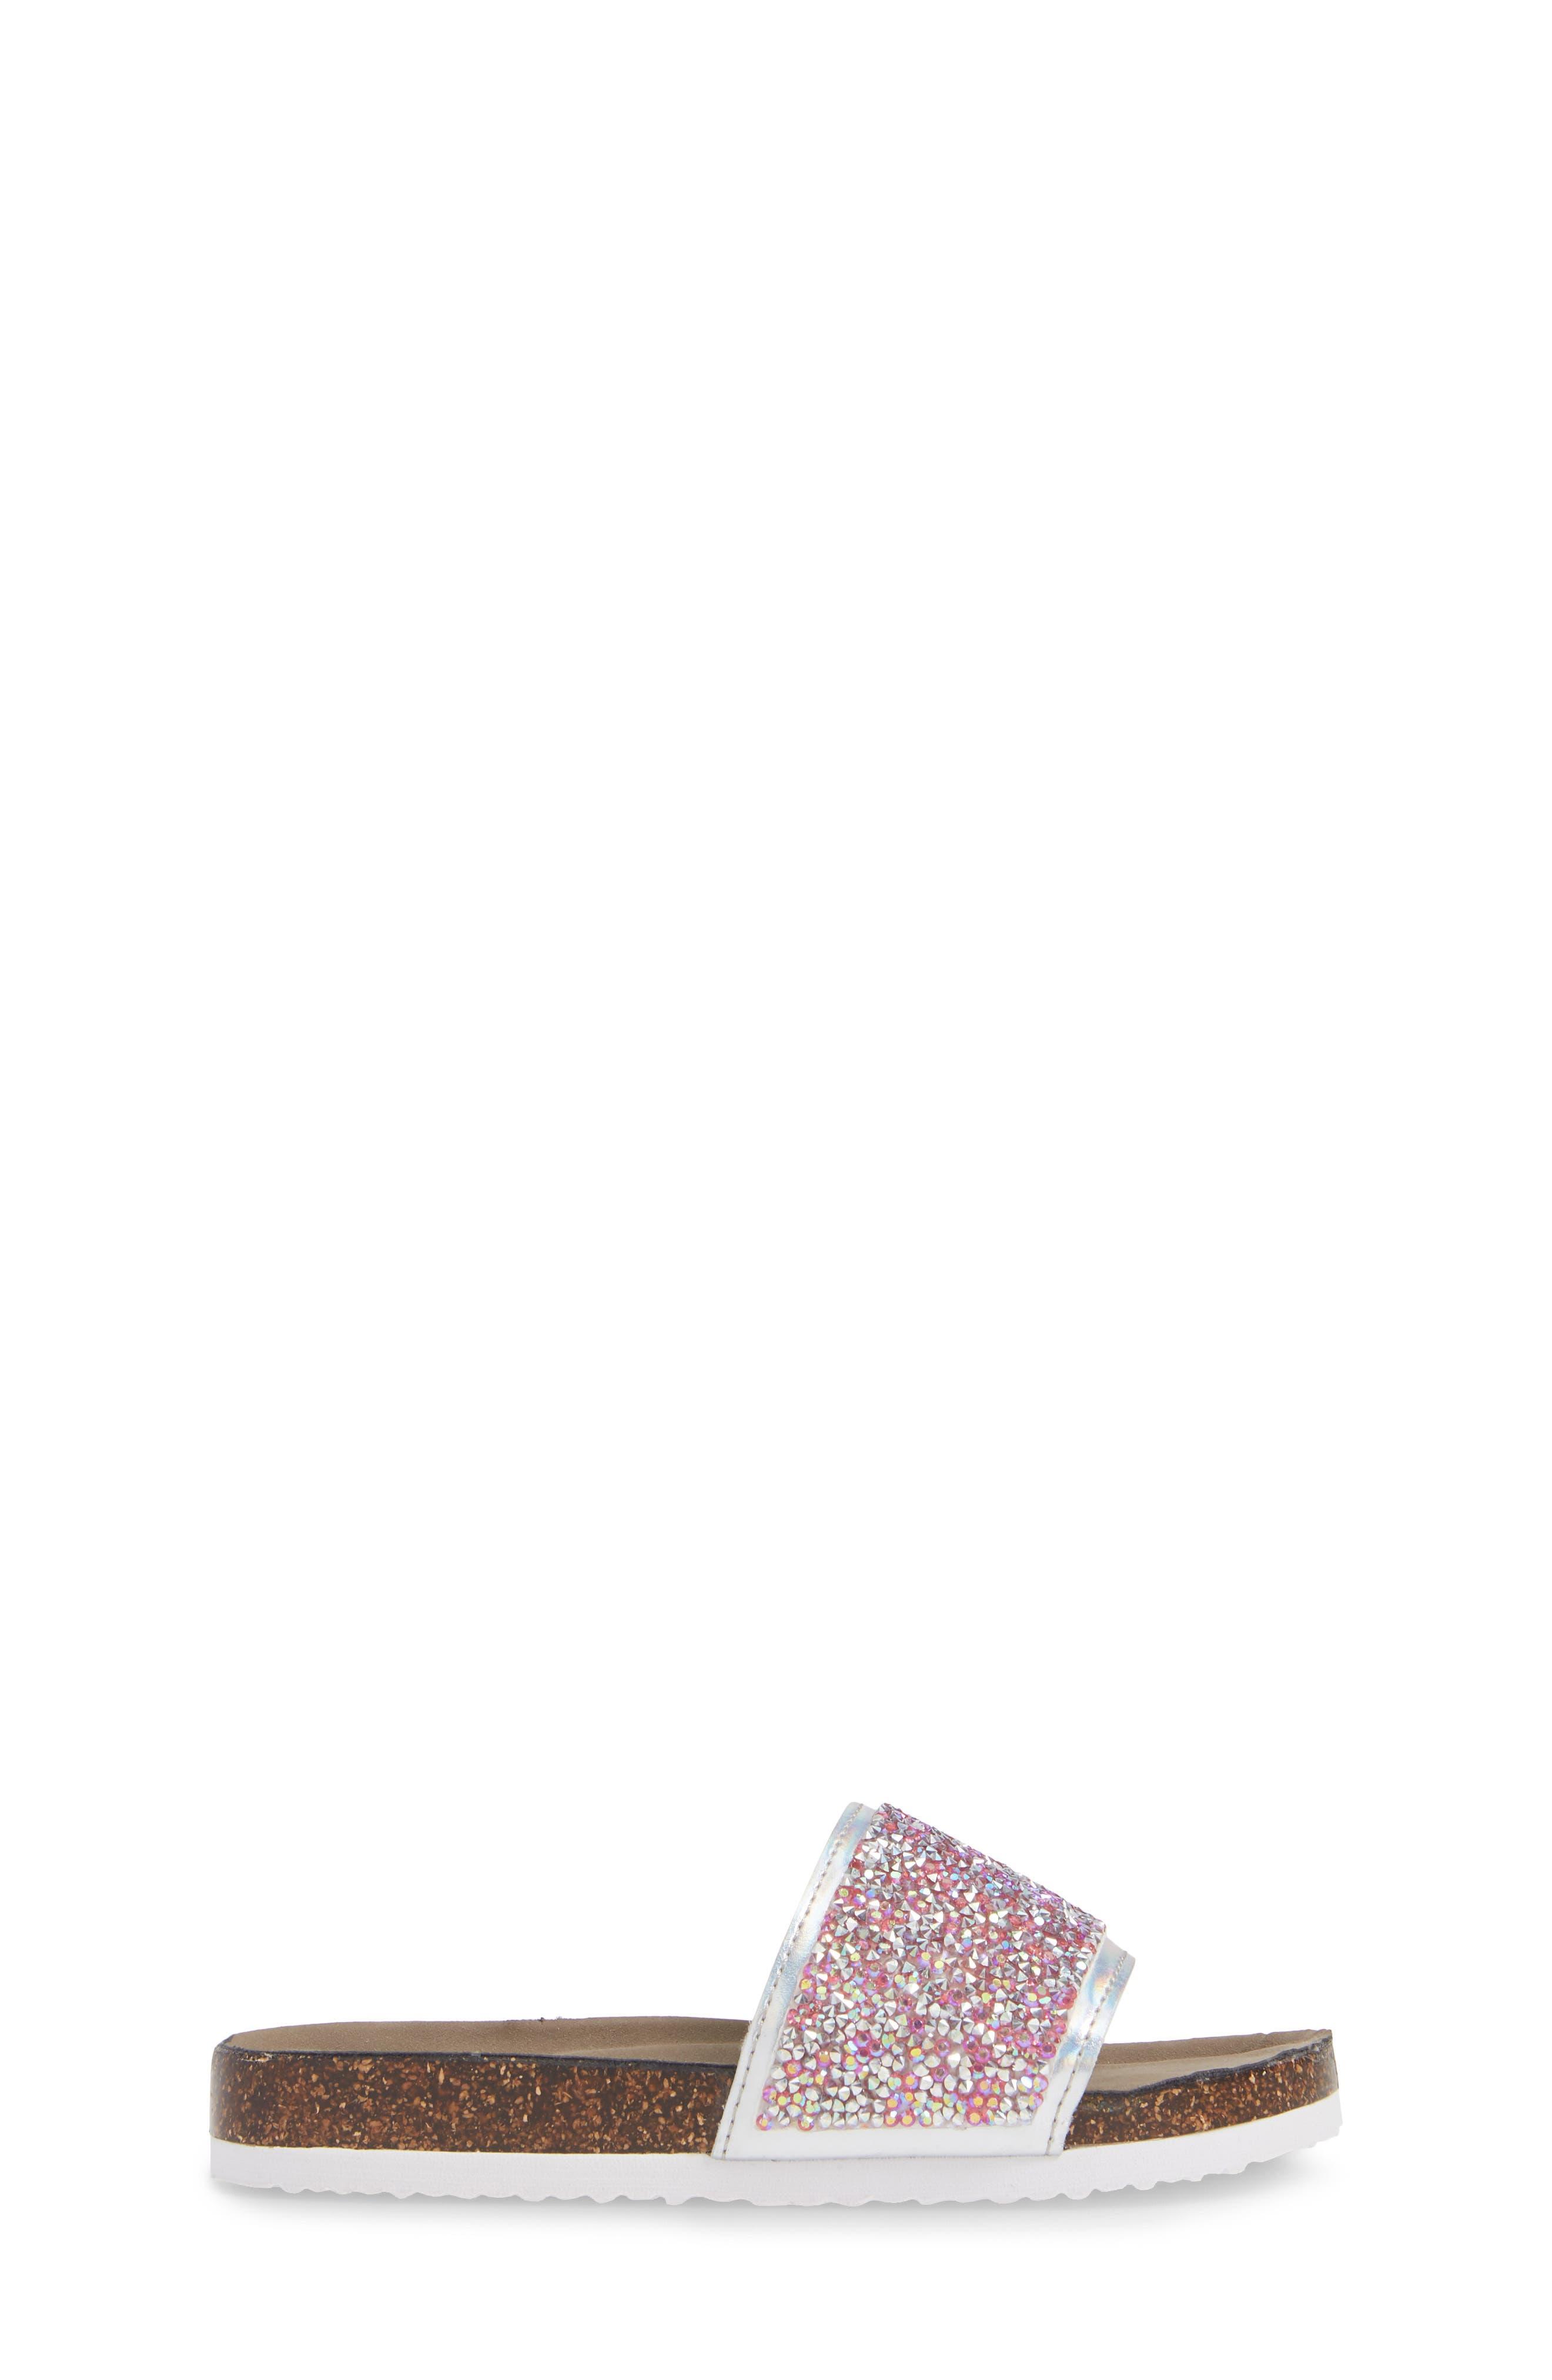 JShineon Sparkle Slide Sandal,                             Alternate thumbnail 3, color,                             PINK MULTI